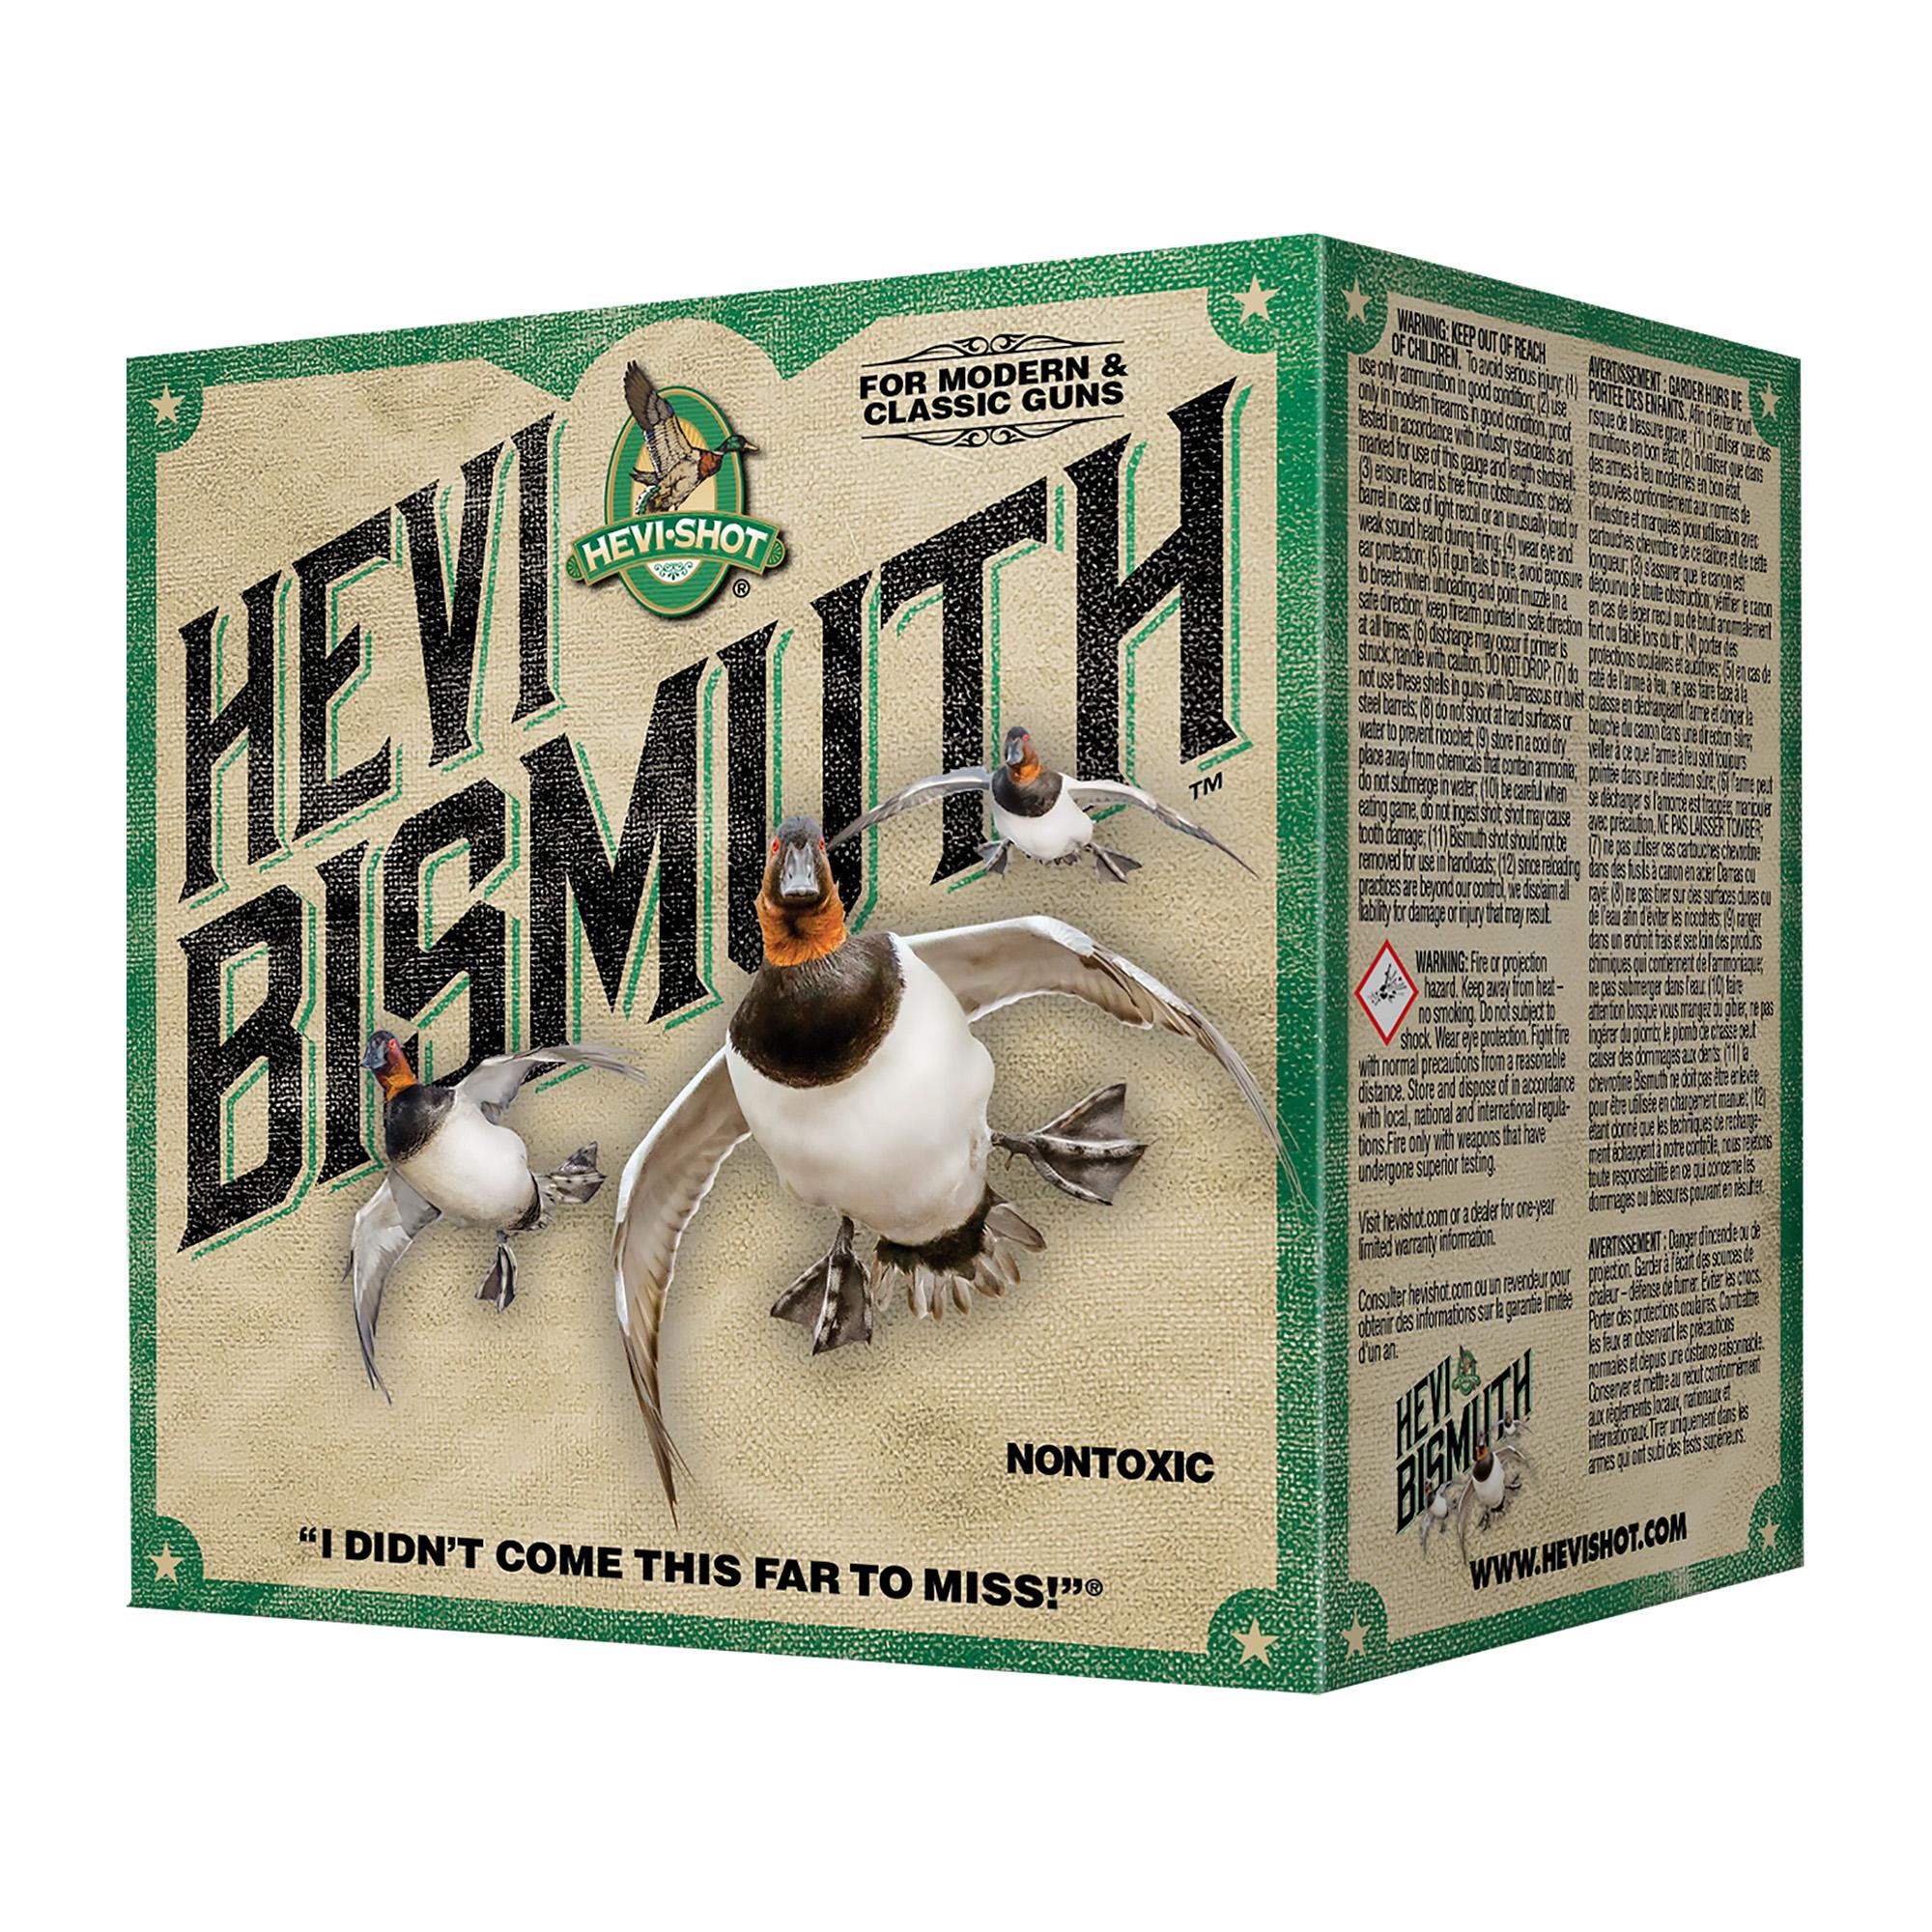 "Hevi Bismuth 12ga 3"" #4 25/250"